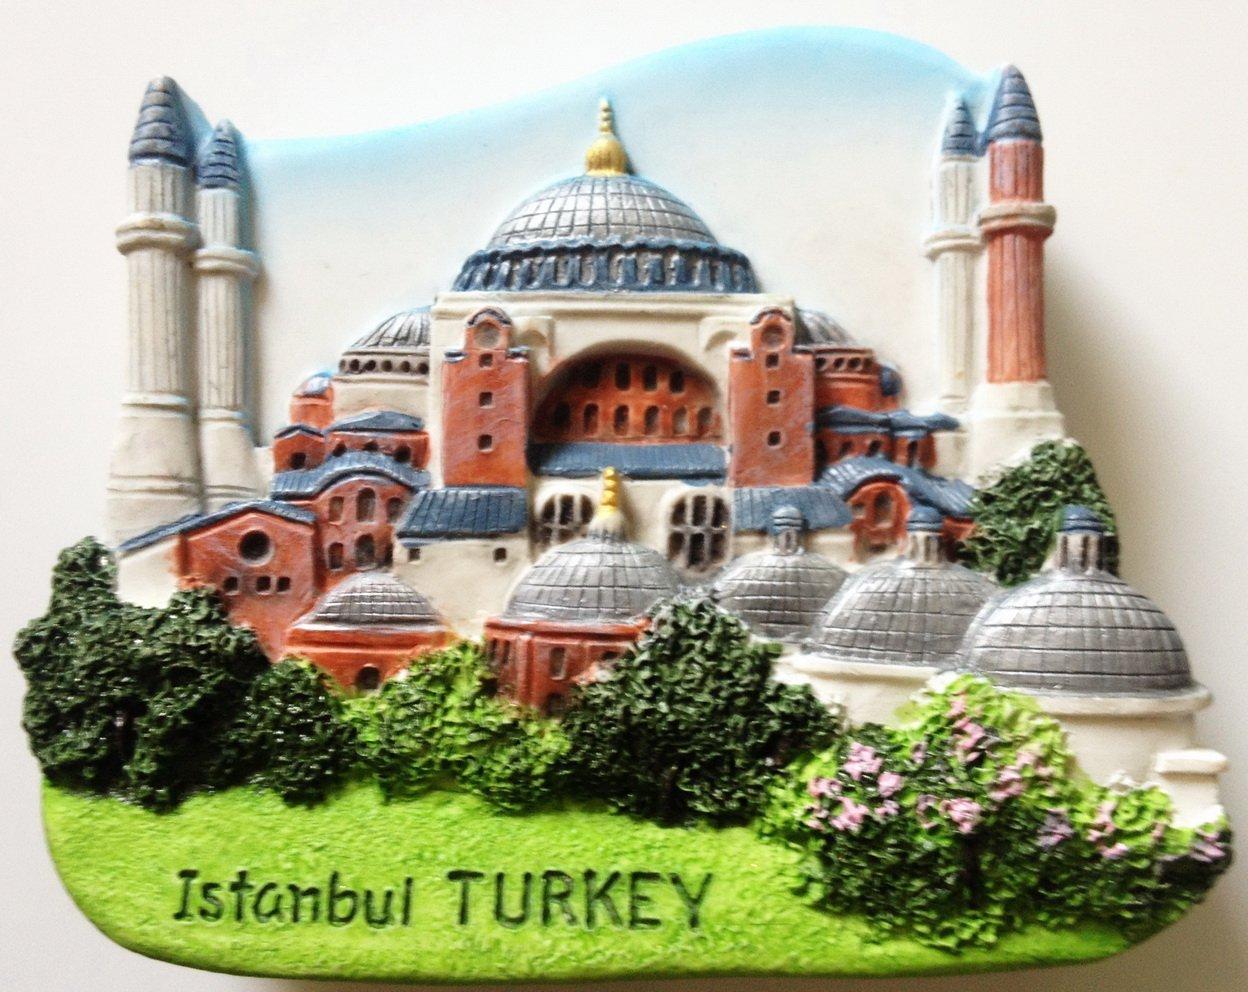 Hagia Sophia Istanbul TURKEY High Quality Resin 3D fridge magnet